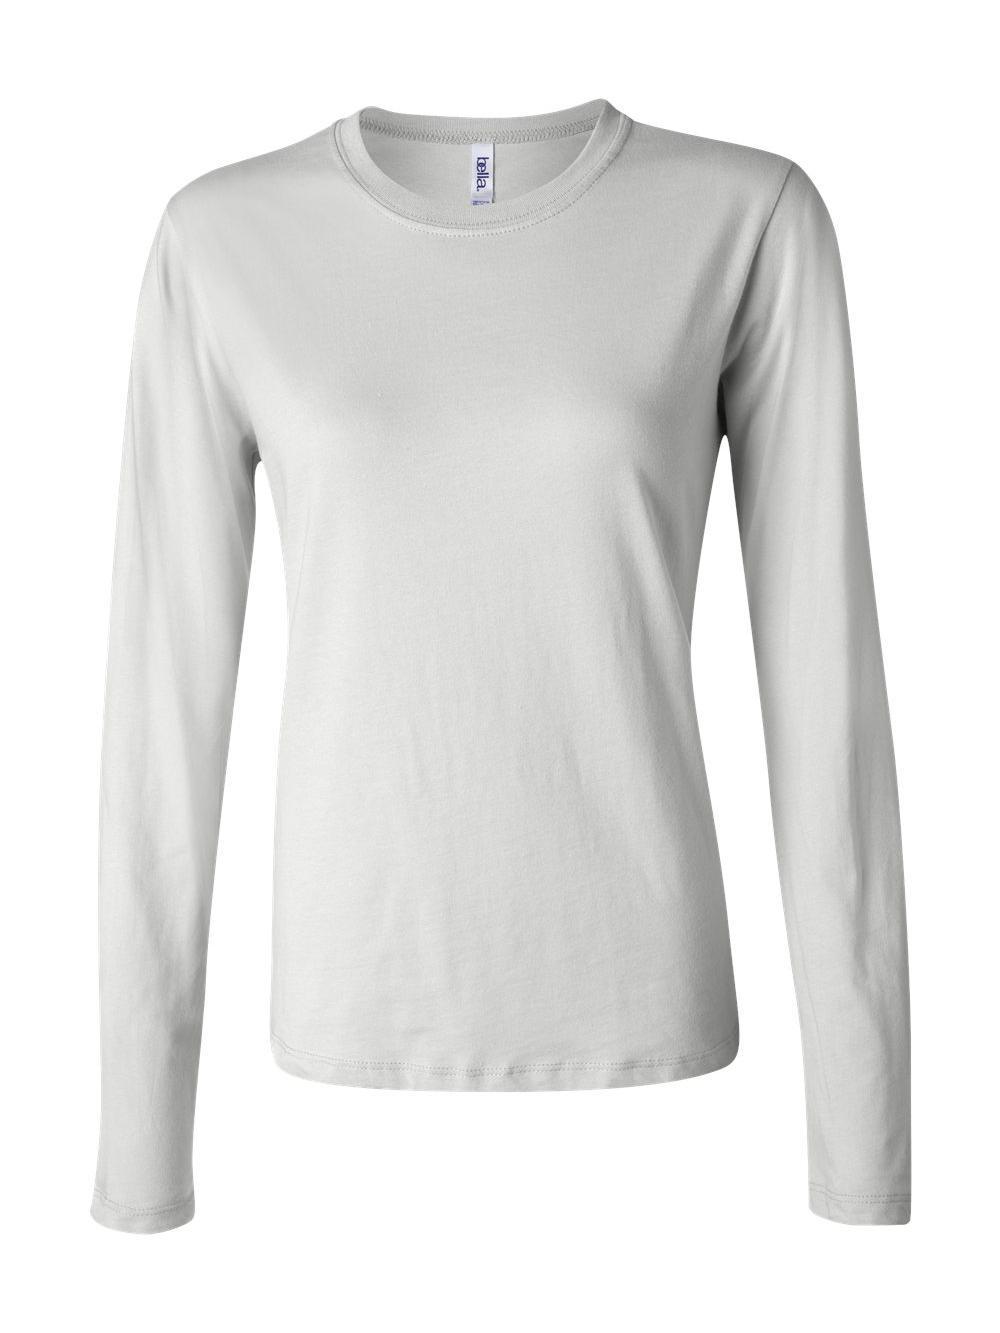 Bella-Canvas-Women-039-s-Long-Sleeve-Jersey-Tee-6500 thumbnail 9